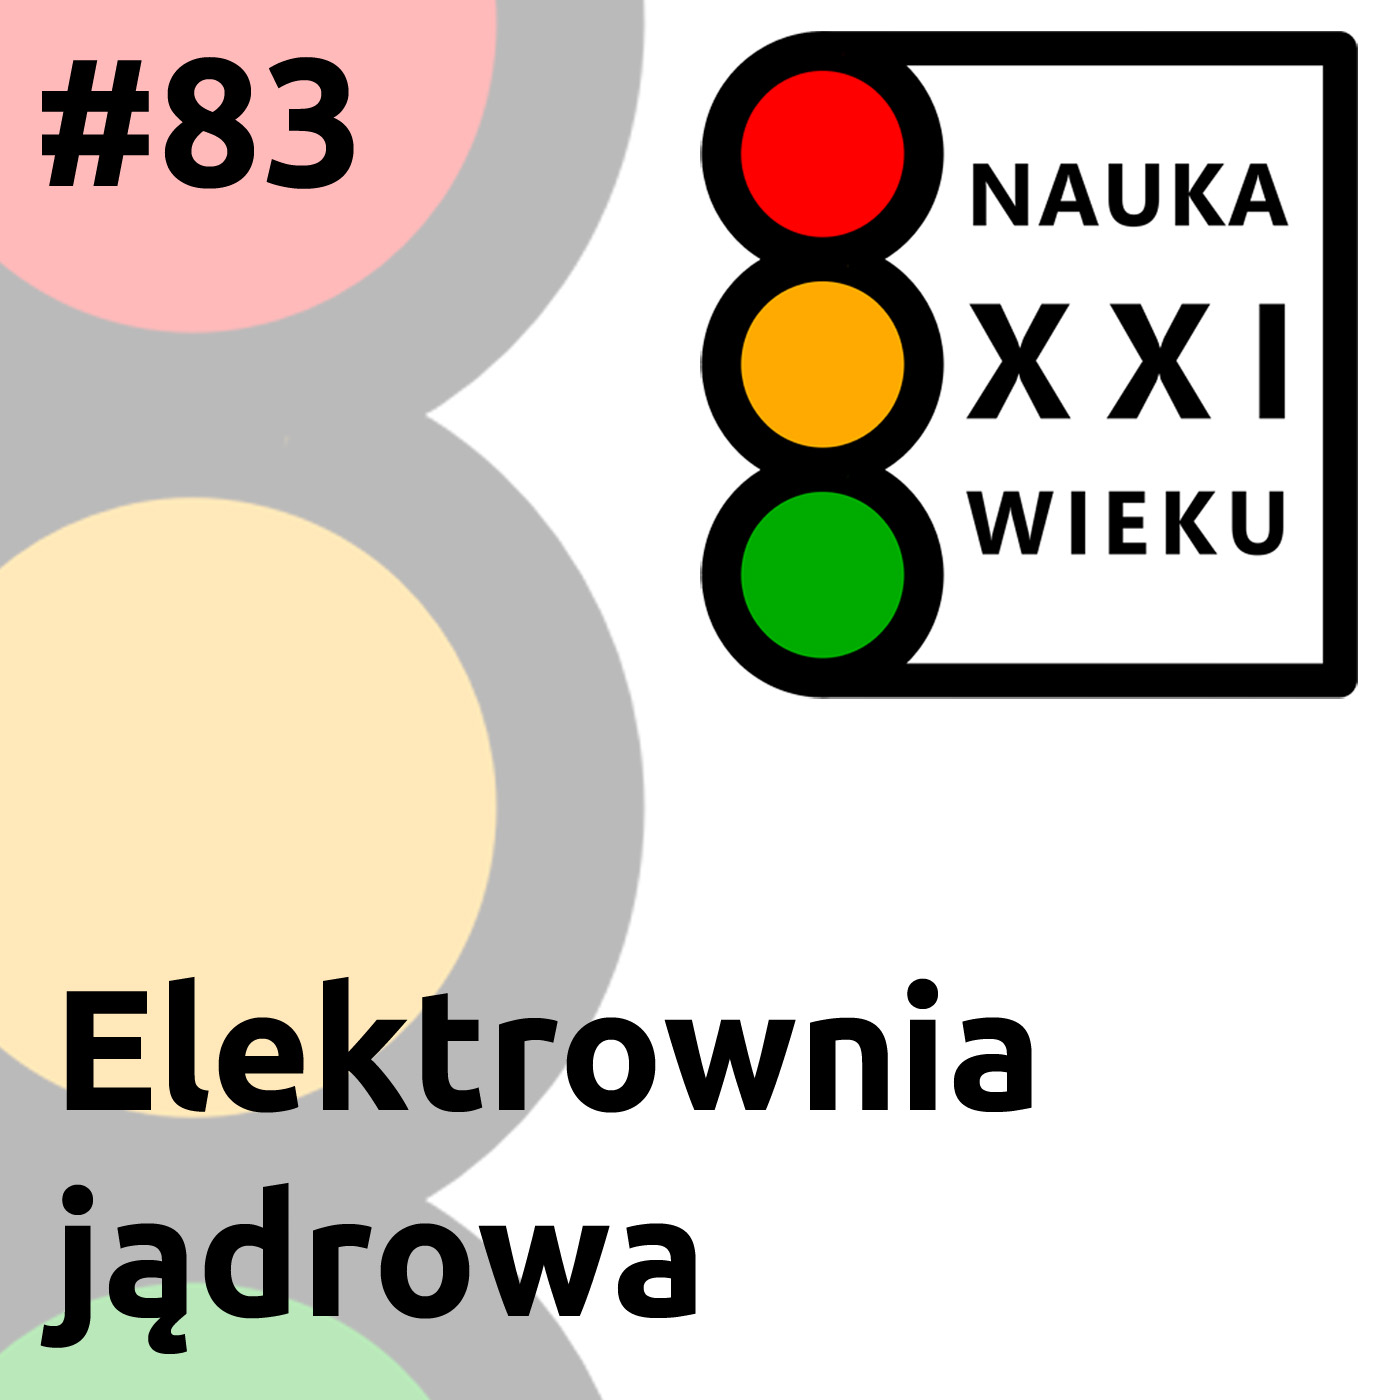 #83 - Elektrownia jądrowa